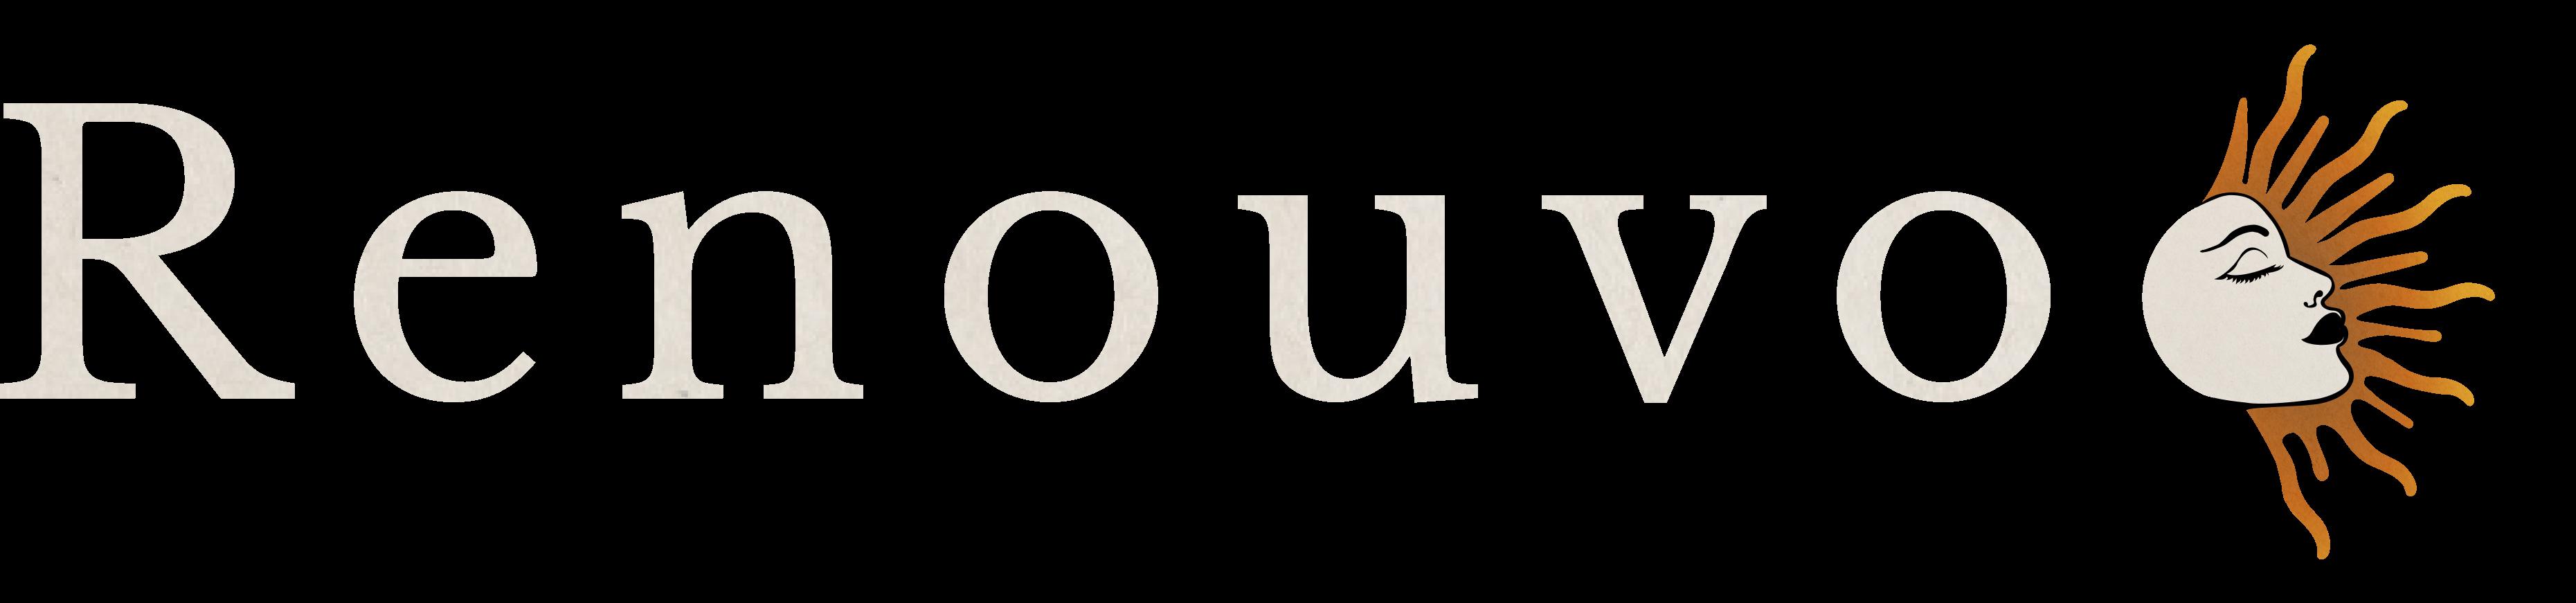 Renouvoo